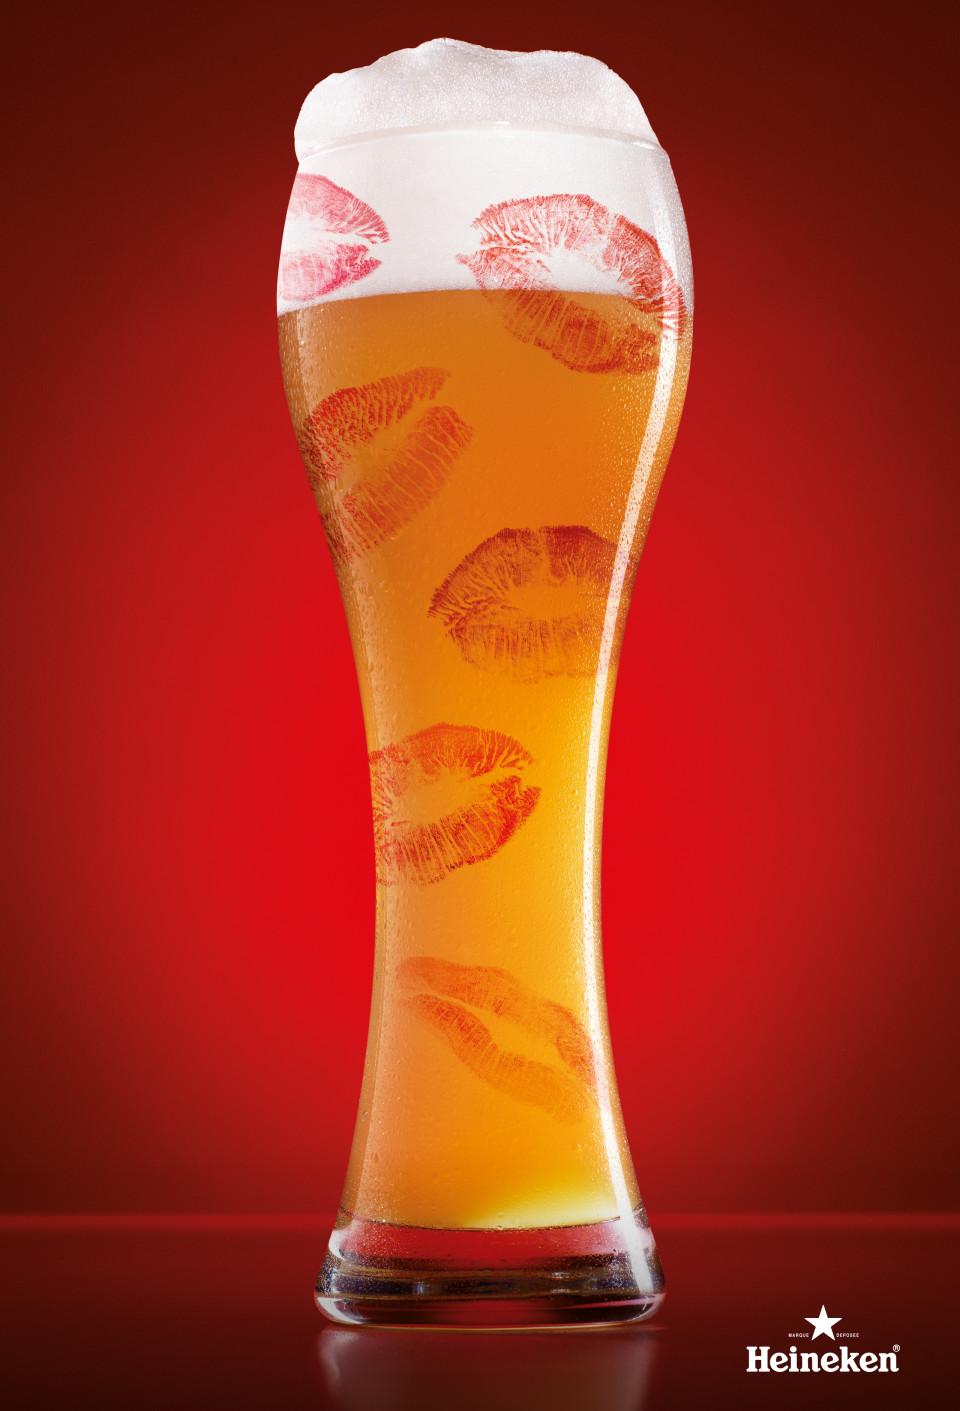 BeerMobile_heineken-960x1411.jpg